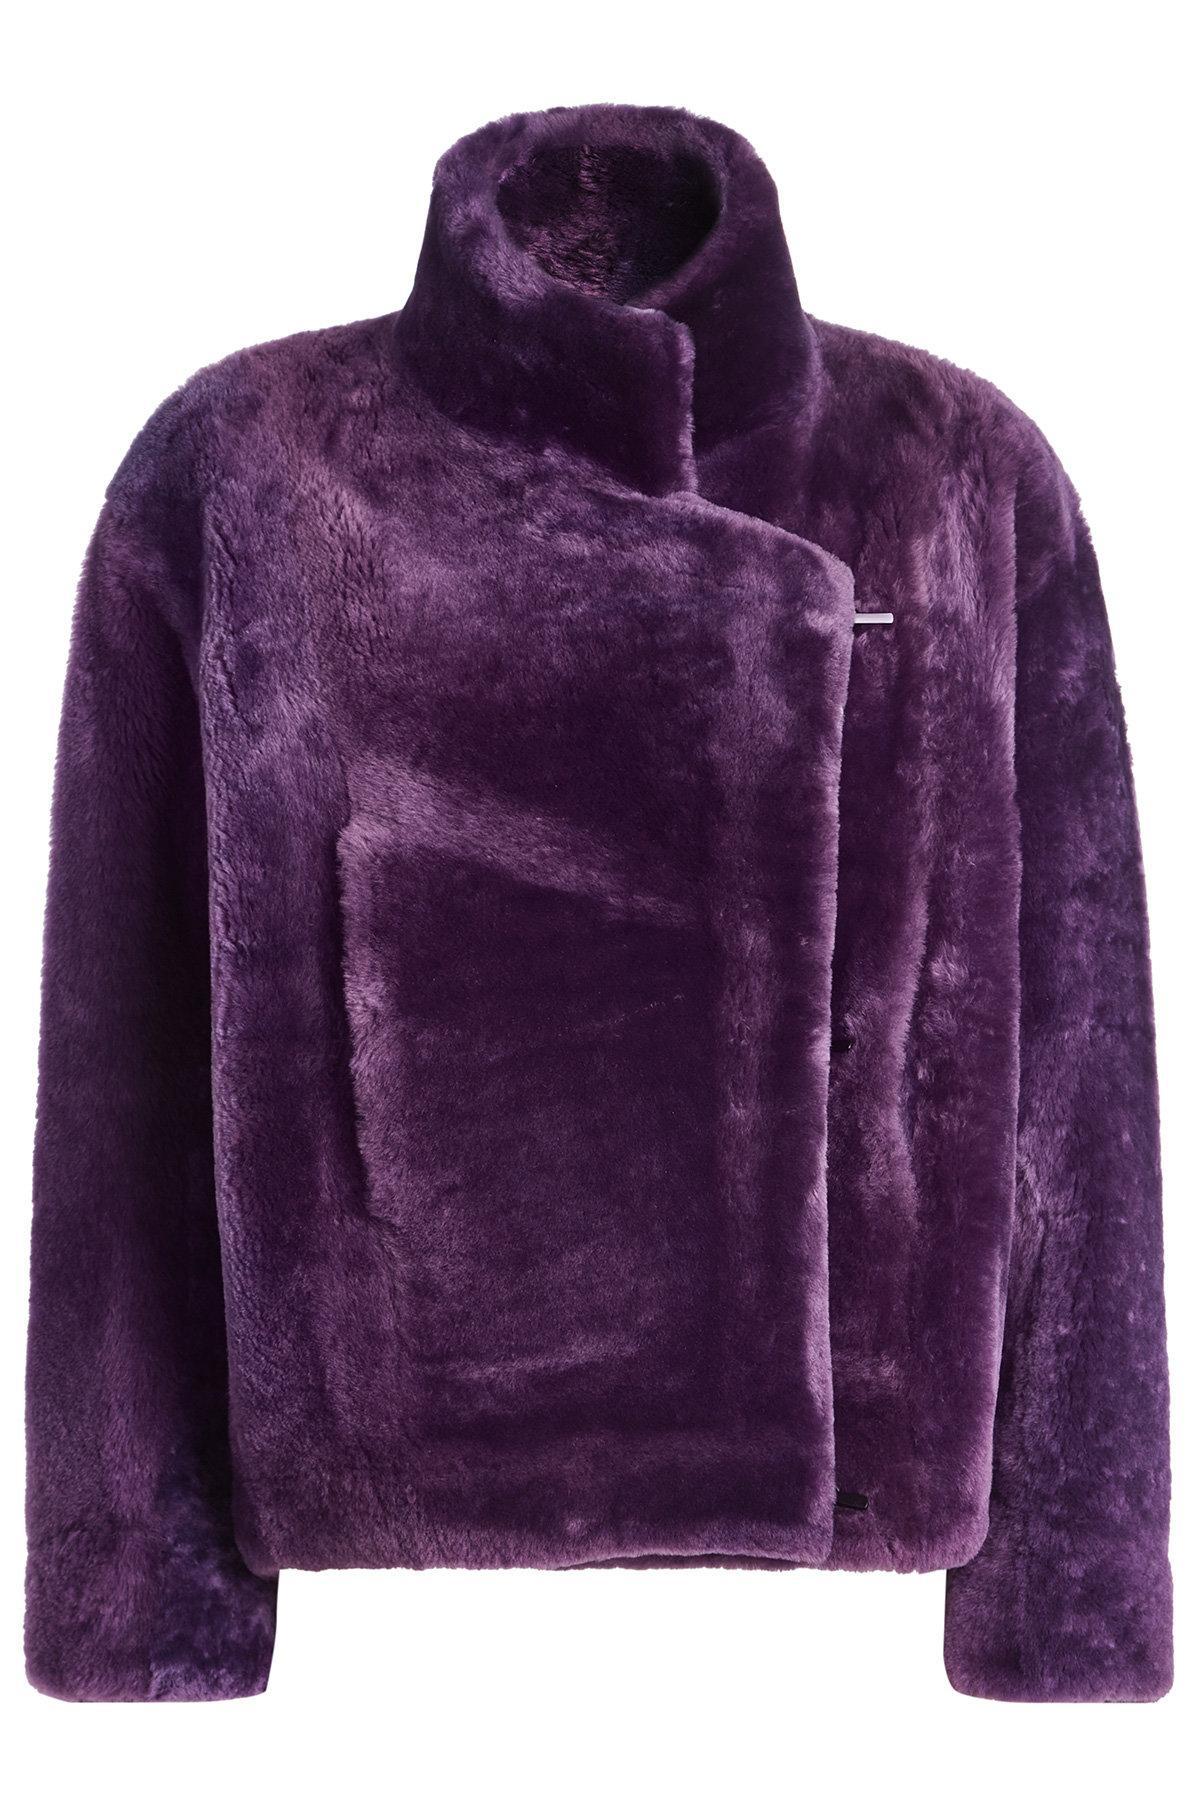 Petar Petrov Fur Jacket In Purple